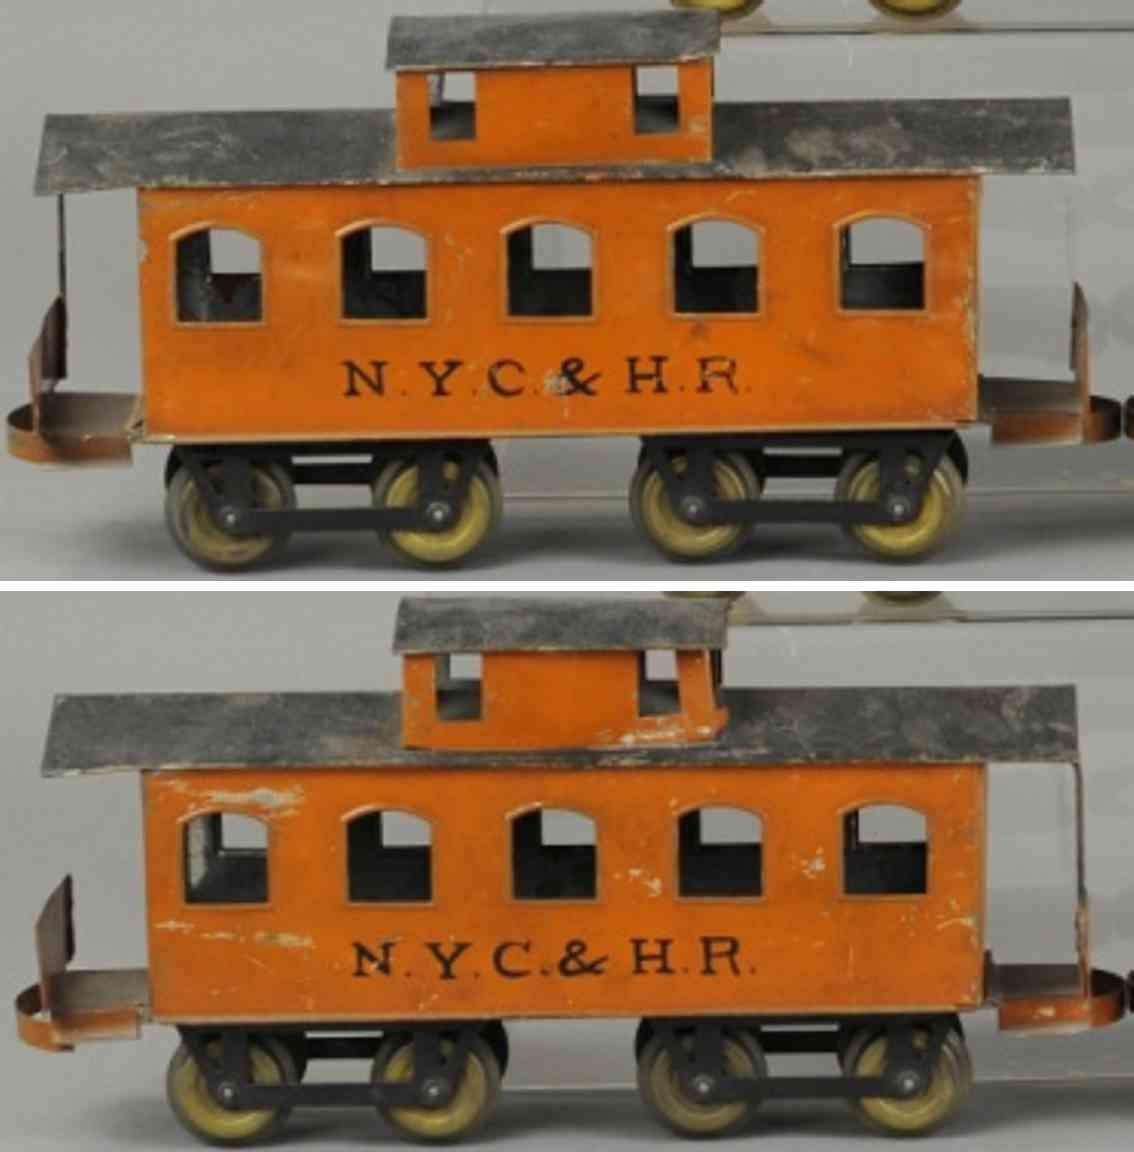 carlisle & finch 92 nyc&hr railway toy caboose orange